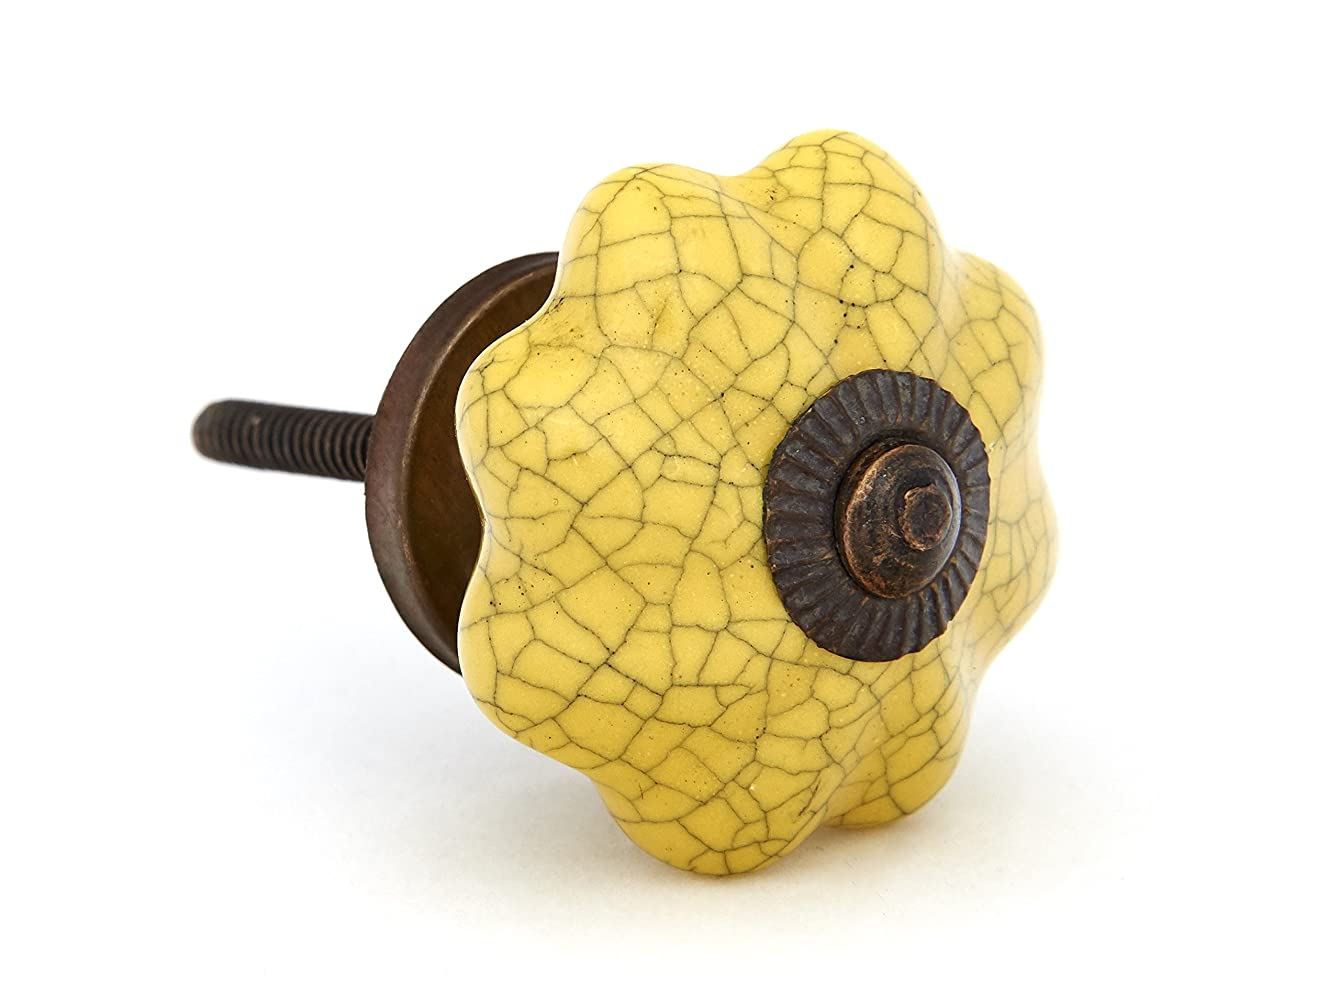 Yellow Crackle Melon Drawer Knob, Cabinet Pull, Furniture Knob - Set of 12